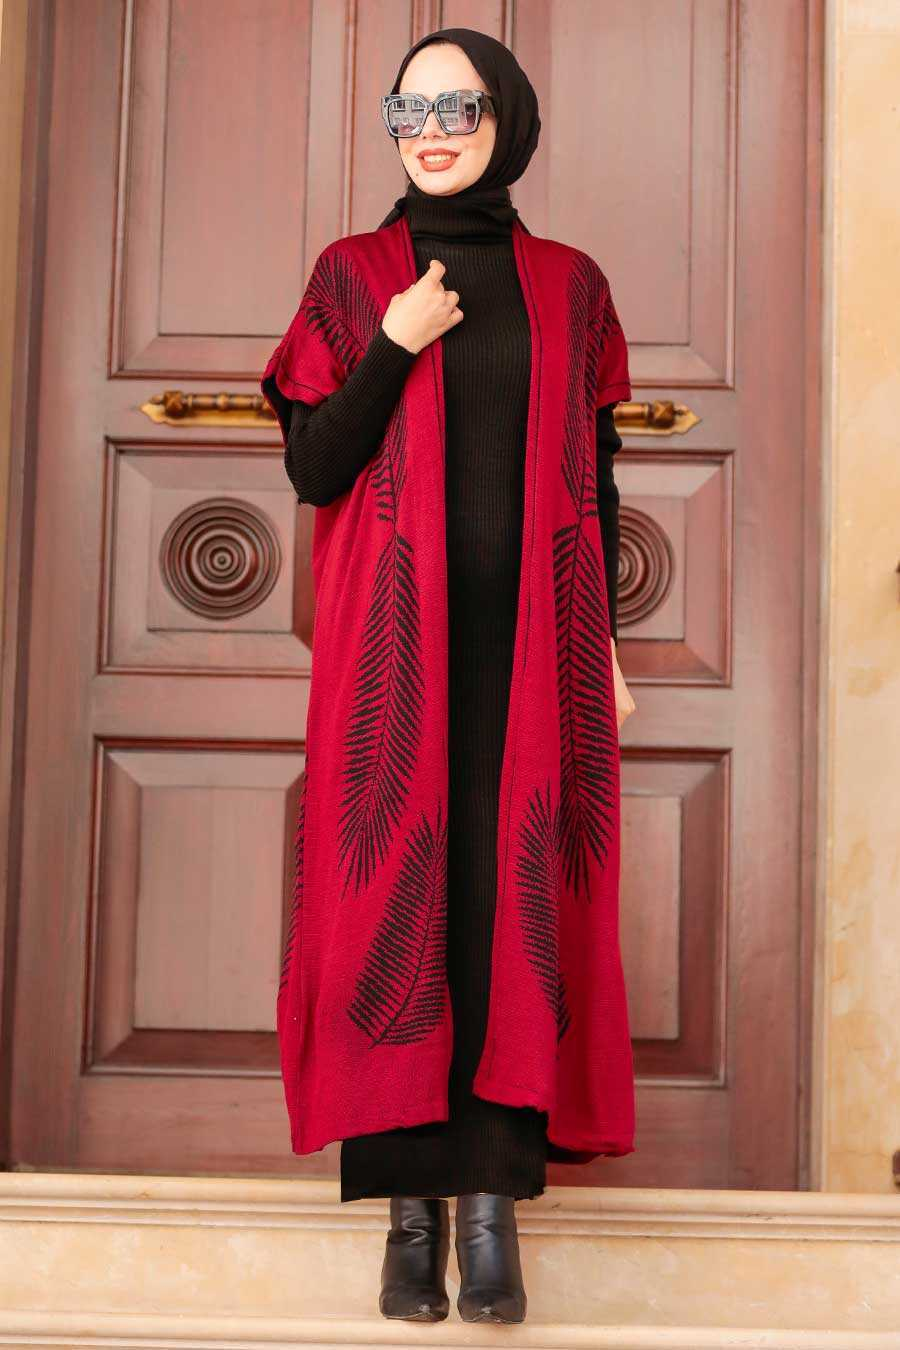 Claret Red Hijab Knitwear Suit Dress 3183BR